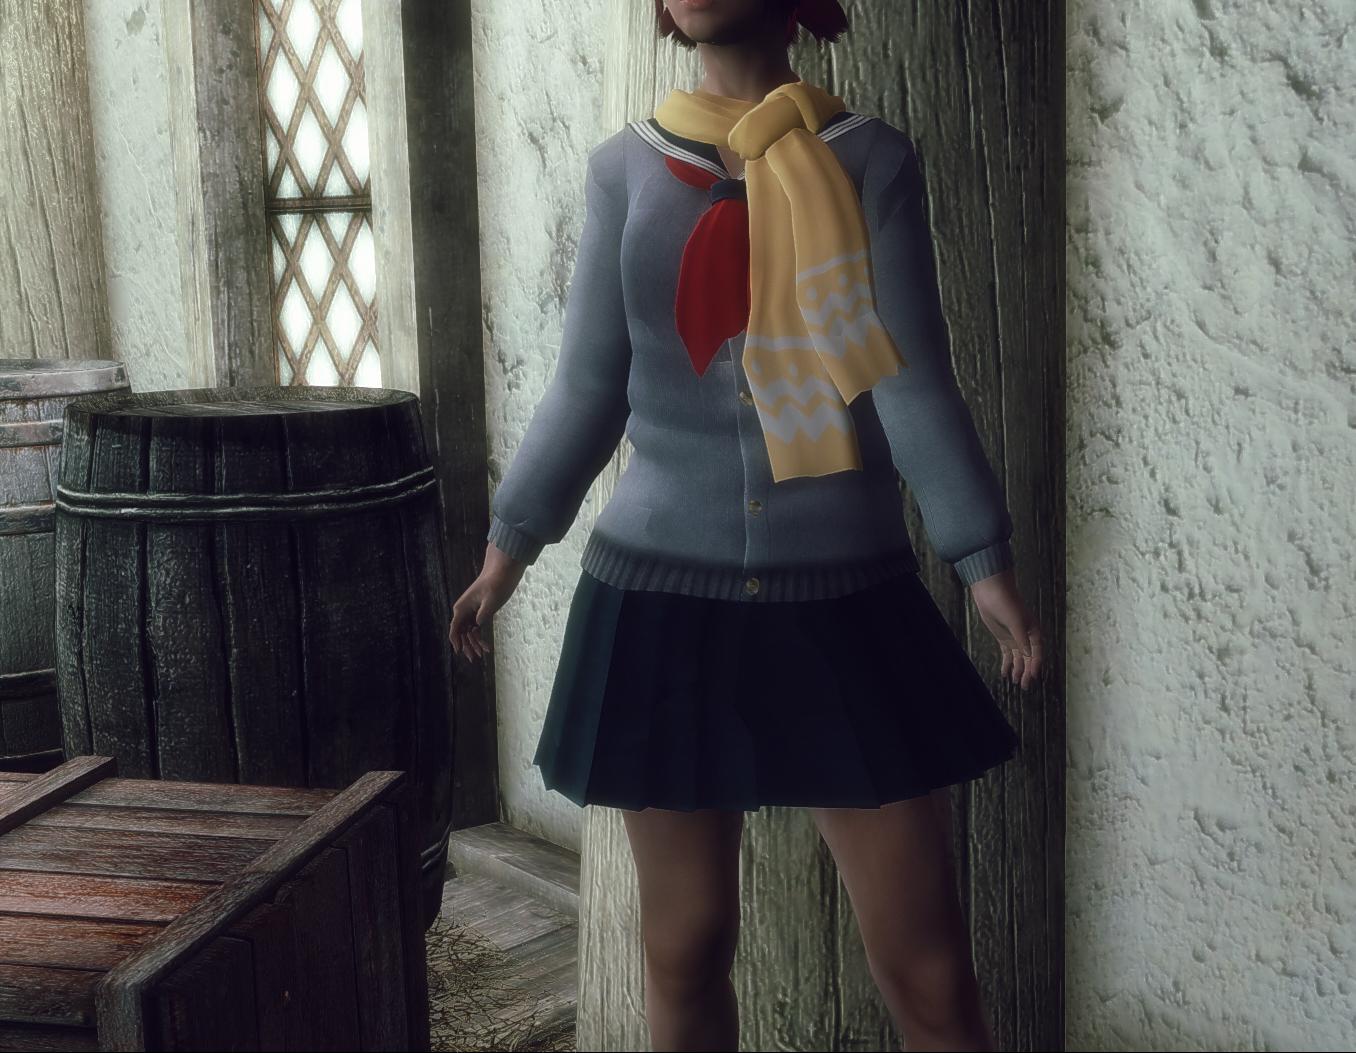 kasumi school sweater skyrim shippin mods and goodies